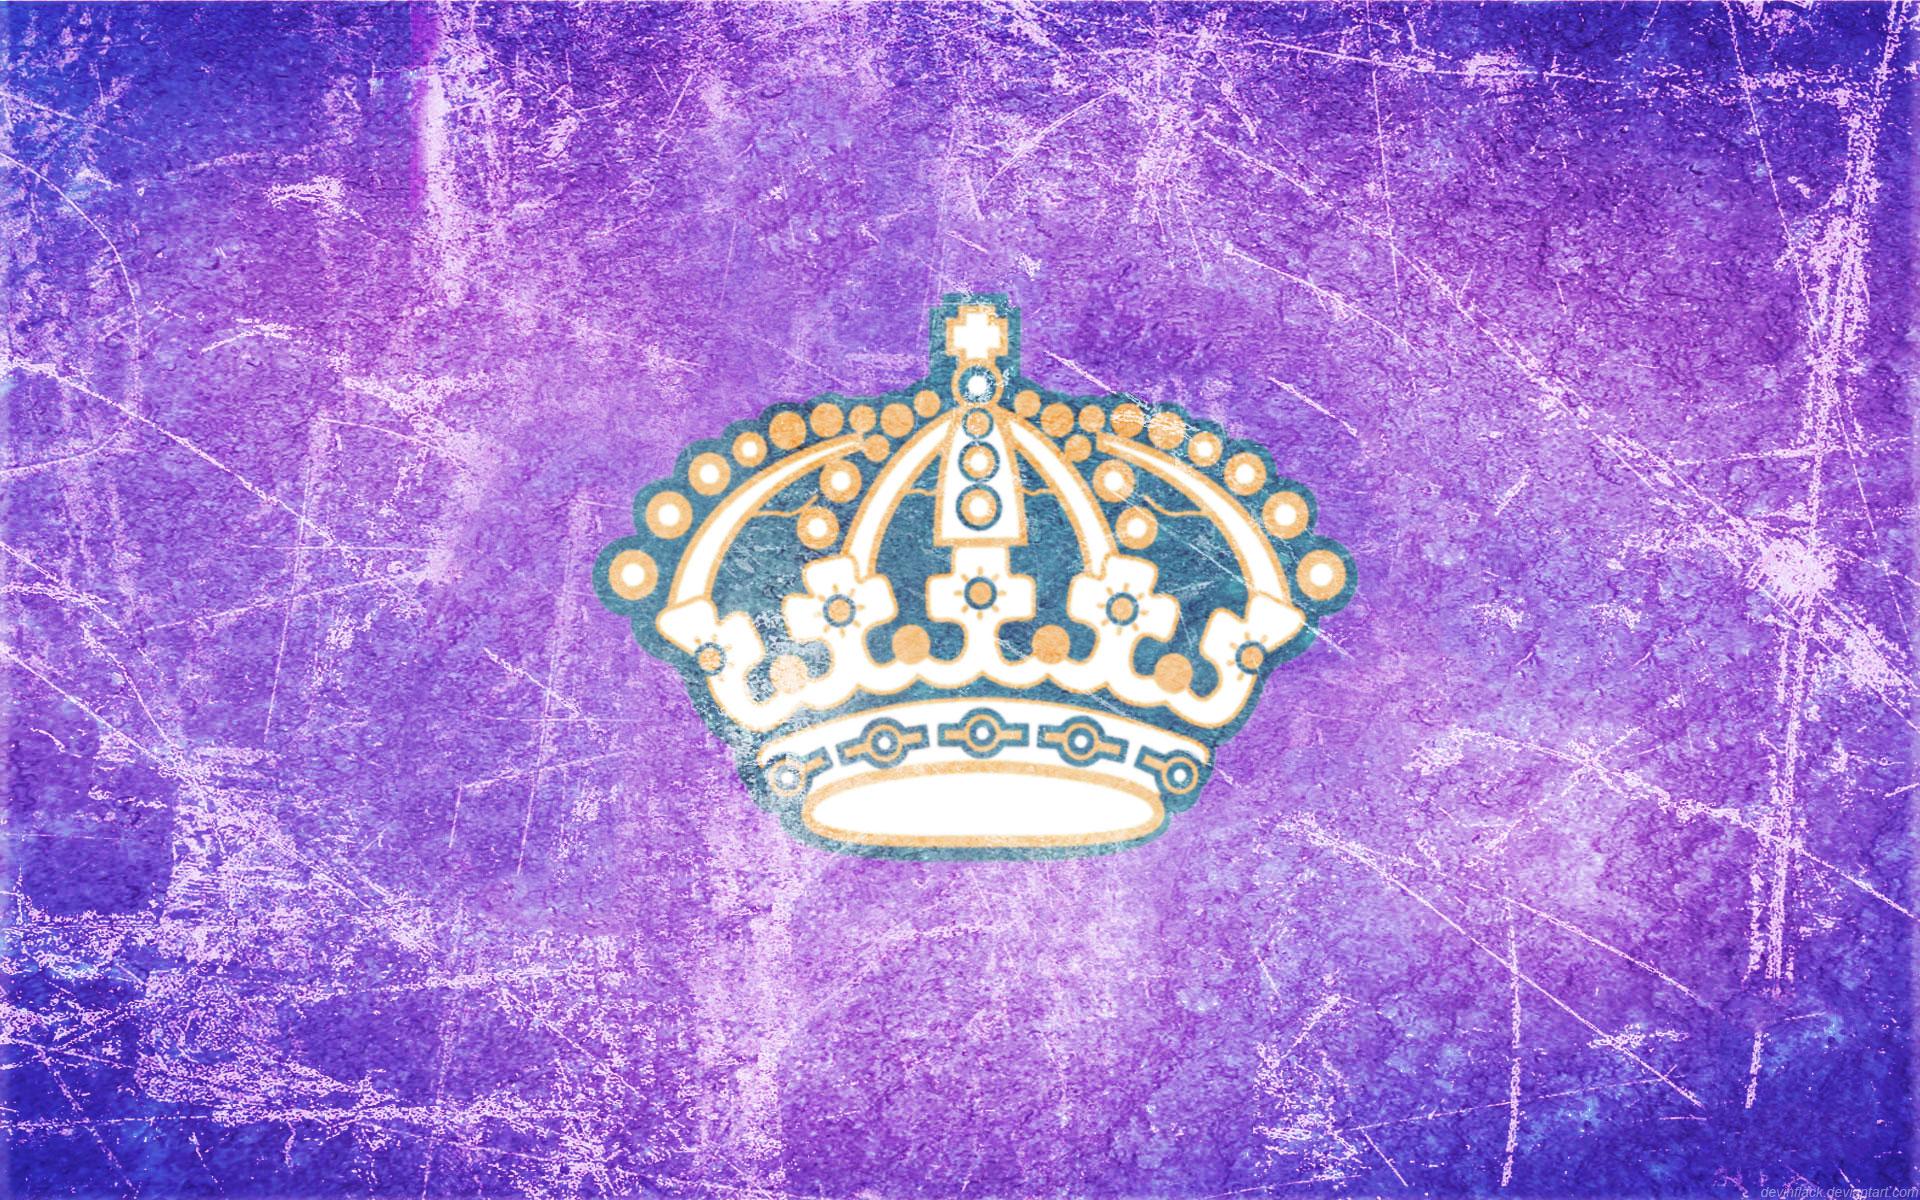 La kings wallpaper 20018 1920x1200 px hdwallsource la kings wallpaper 20018 voltagebd Choice Image